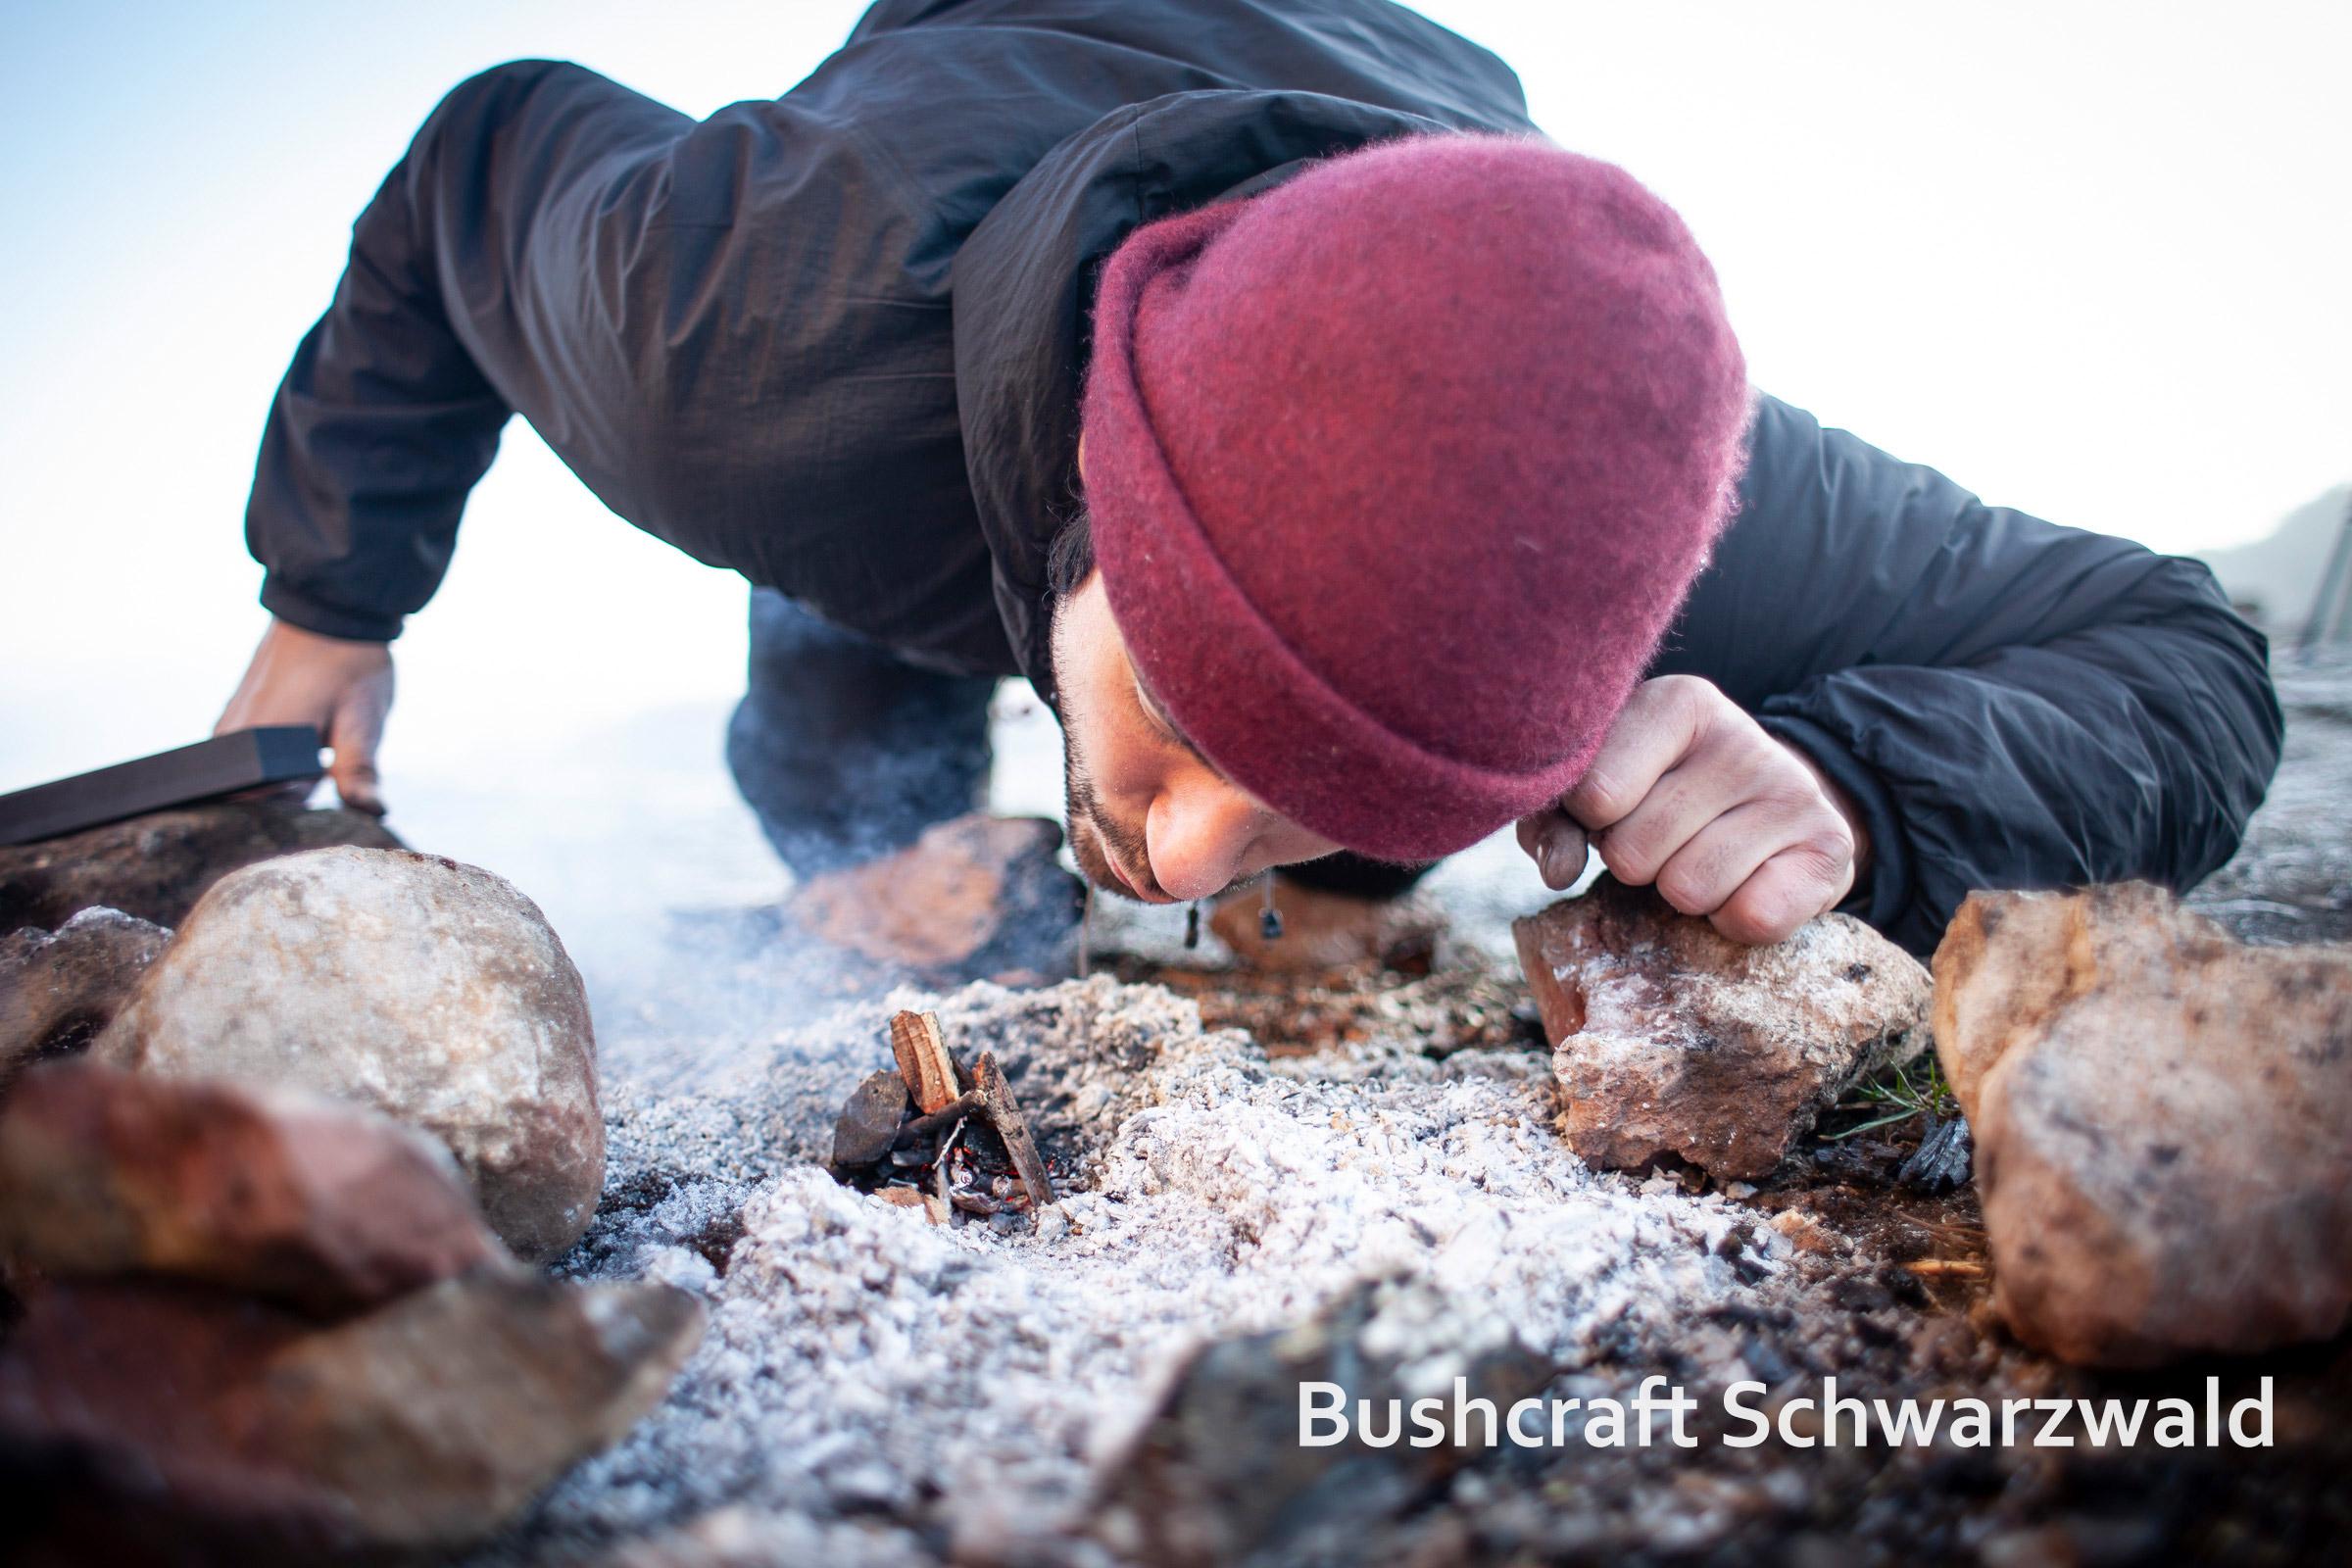 Bushcraft Schwarzwald